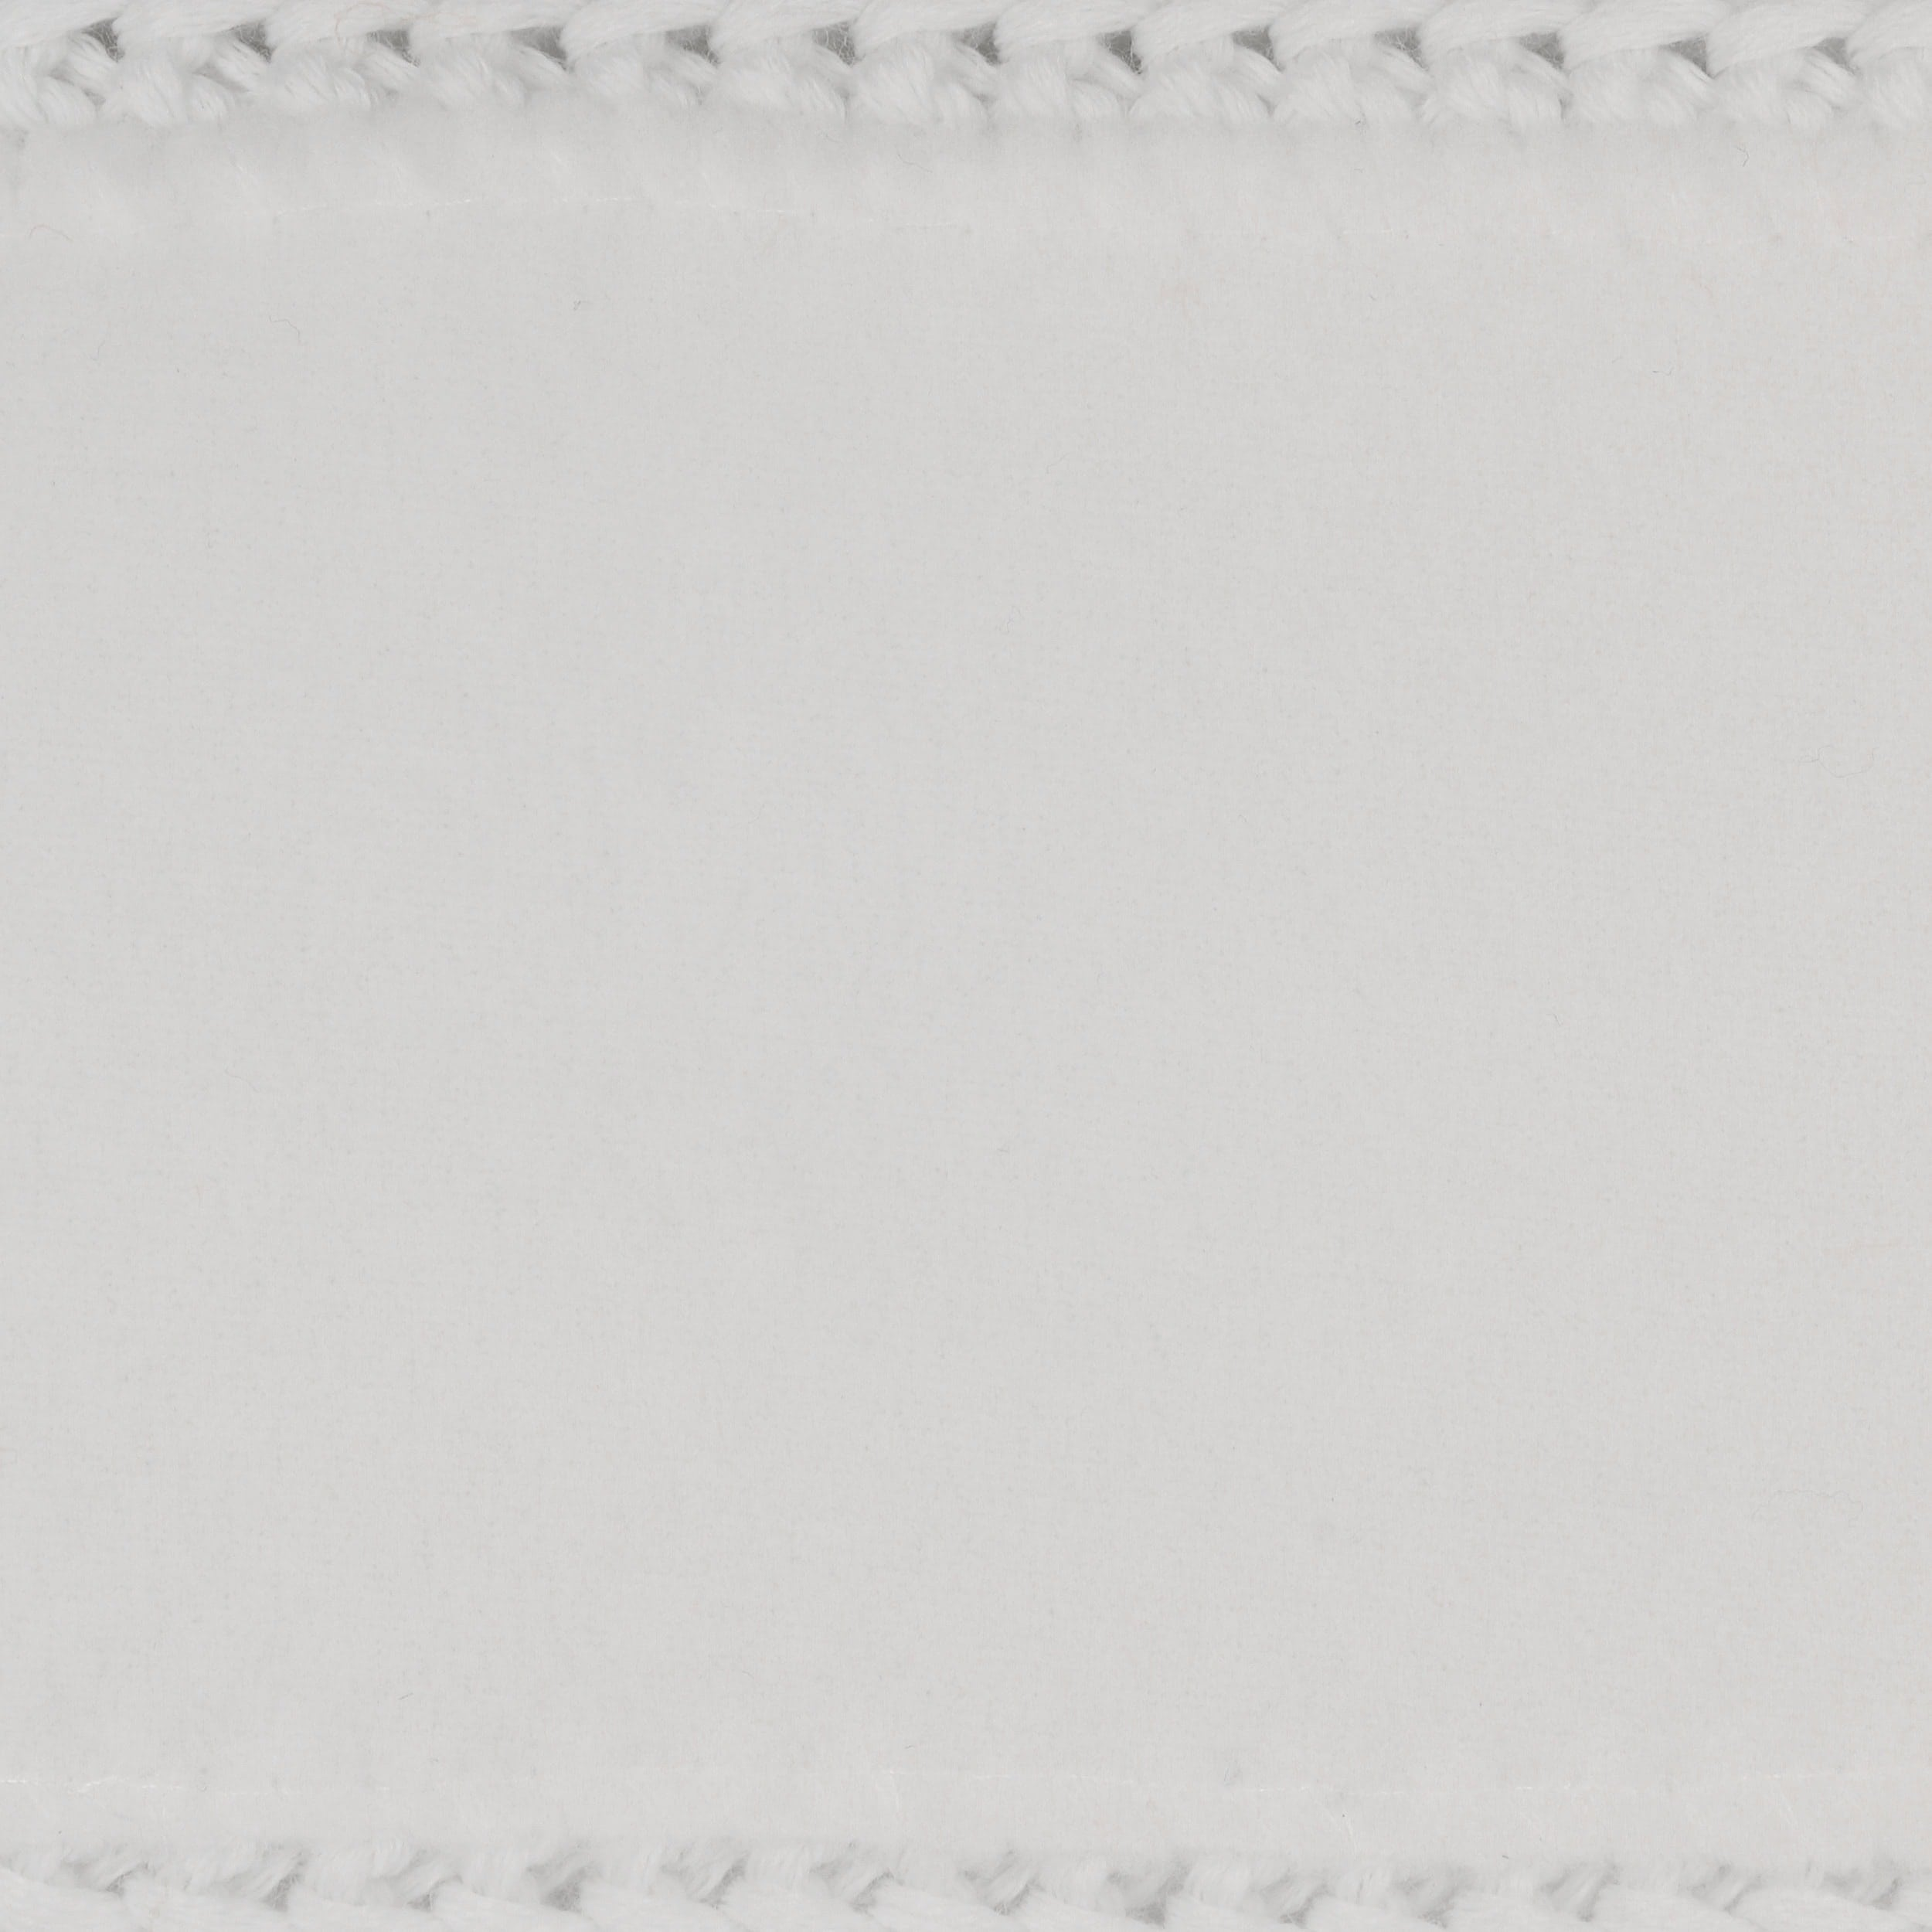 ... Fascia per Capelli Jamie Skipool by Eisbär - nero 3 ... 61c0b30537c2